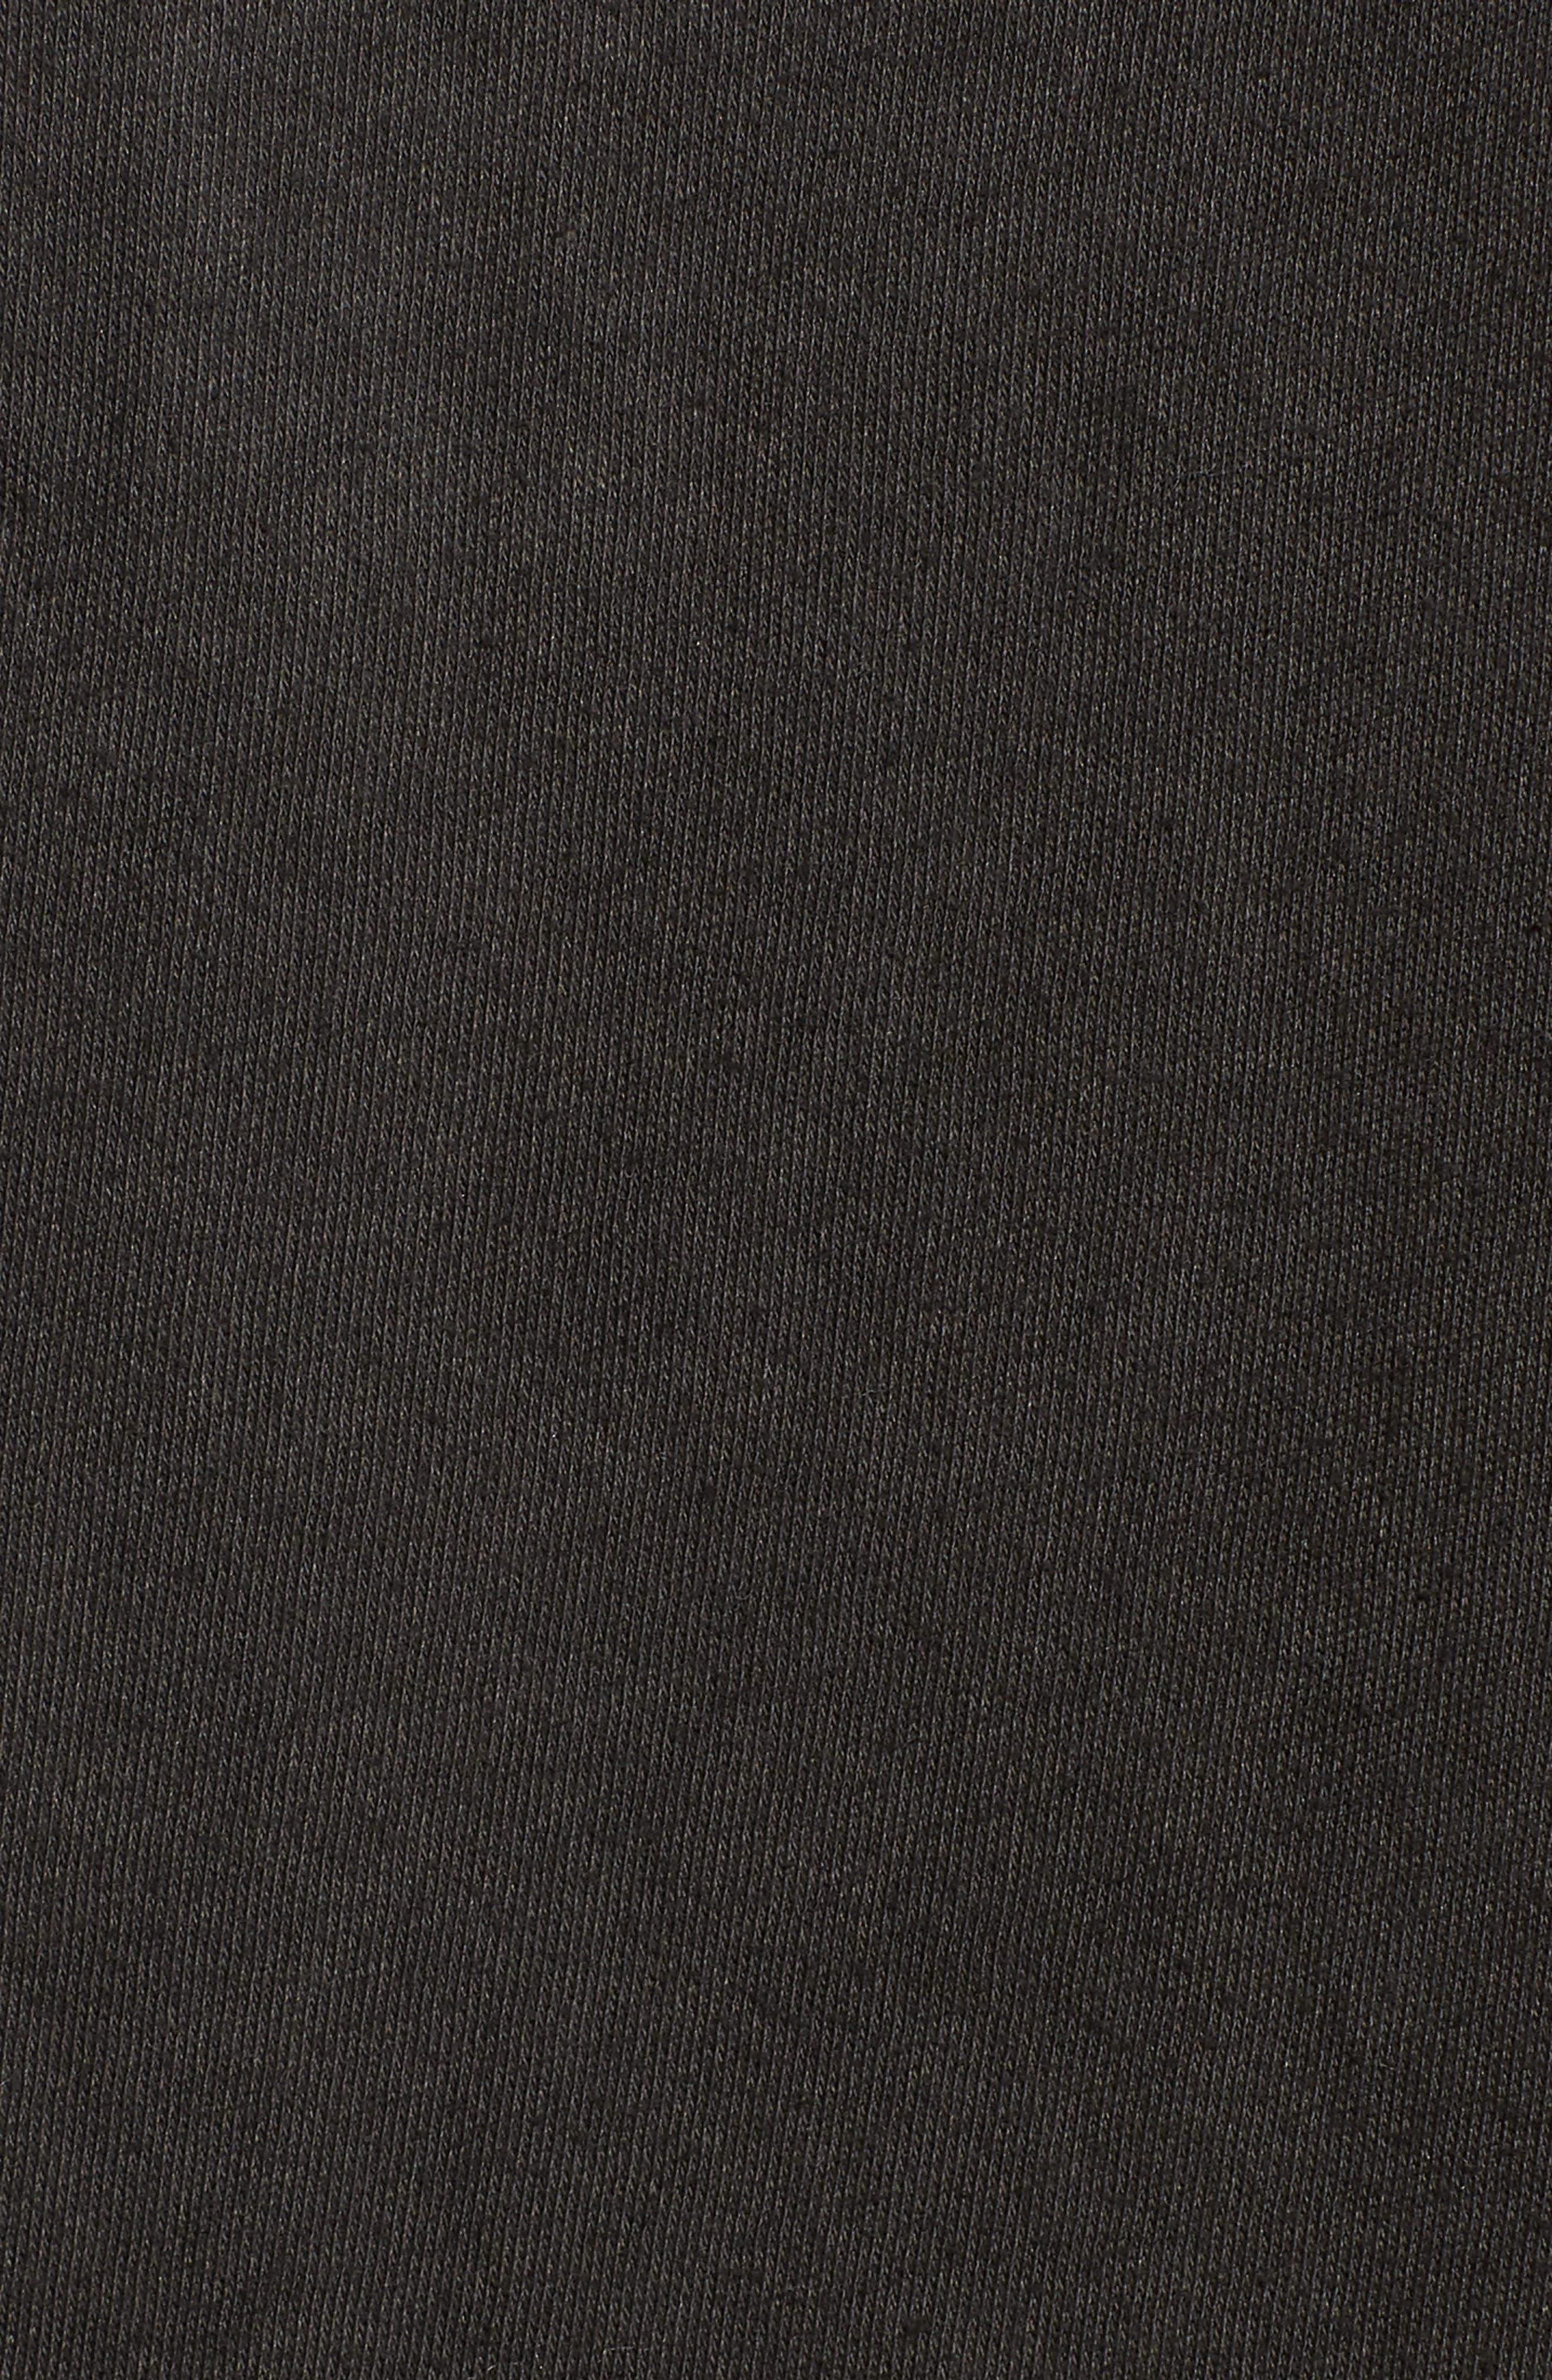 Los Angeles Graphic Muscle Tee,                             Alternate thumbnail 5, color,                             Vintage Black